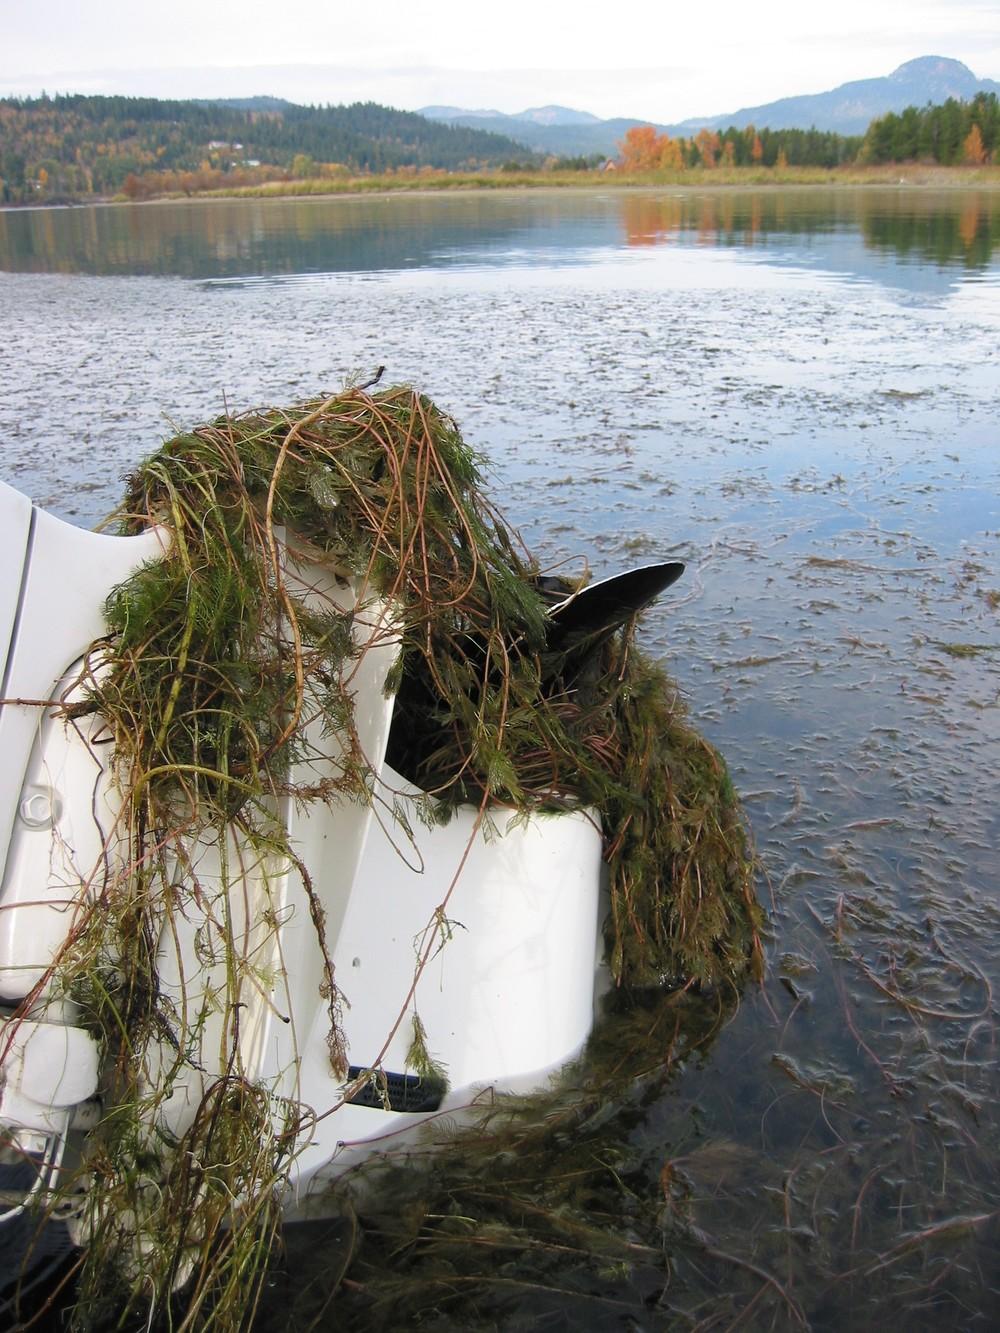 Eurasian watermilfoil